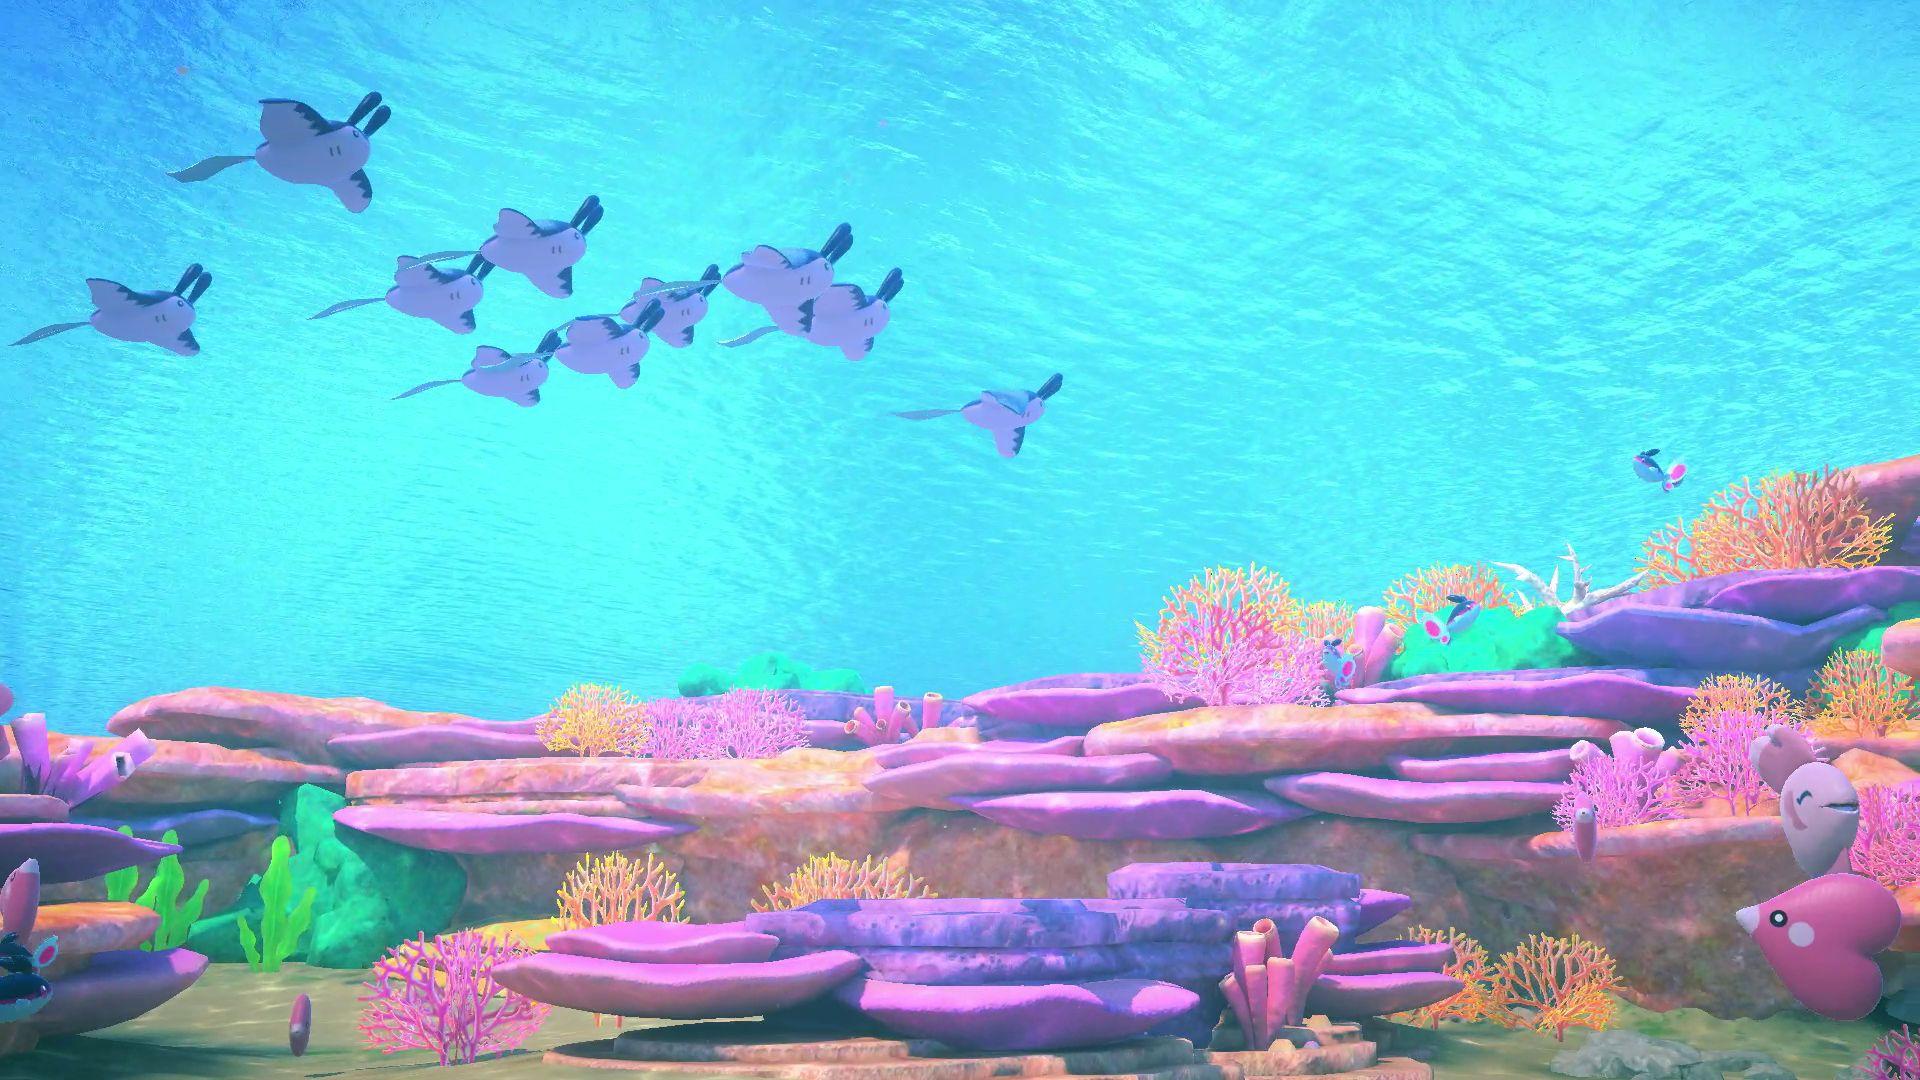 Screenshot of underwater Pokémon in the Lental Region in New Pokémon Snap